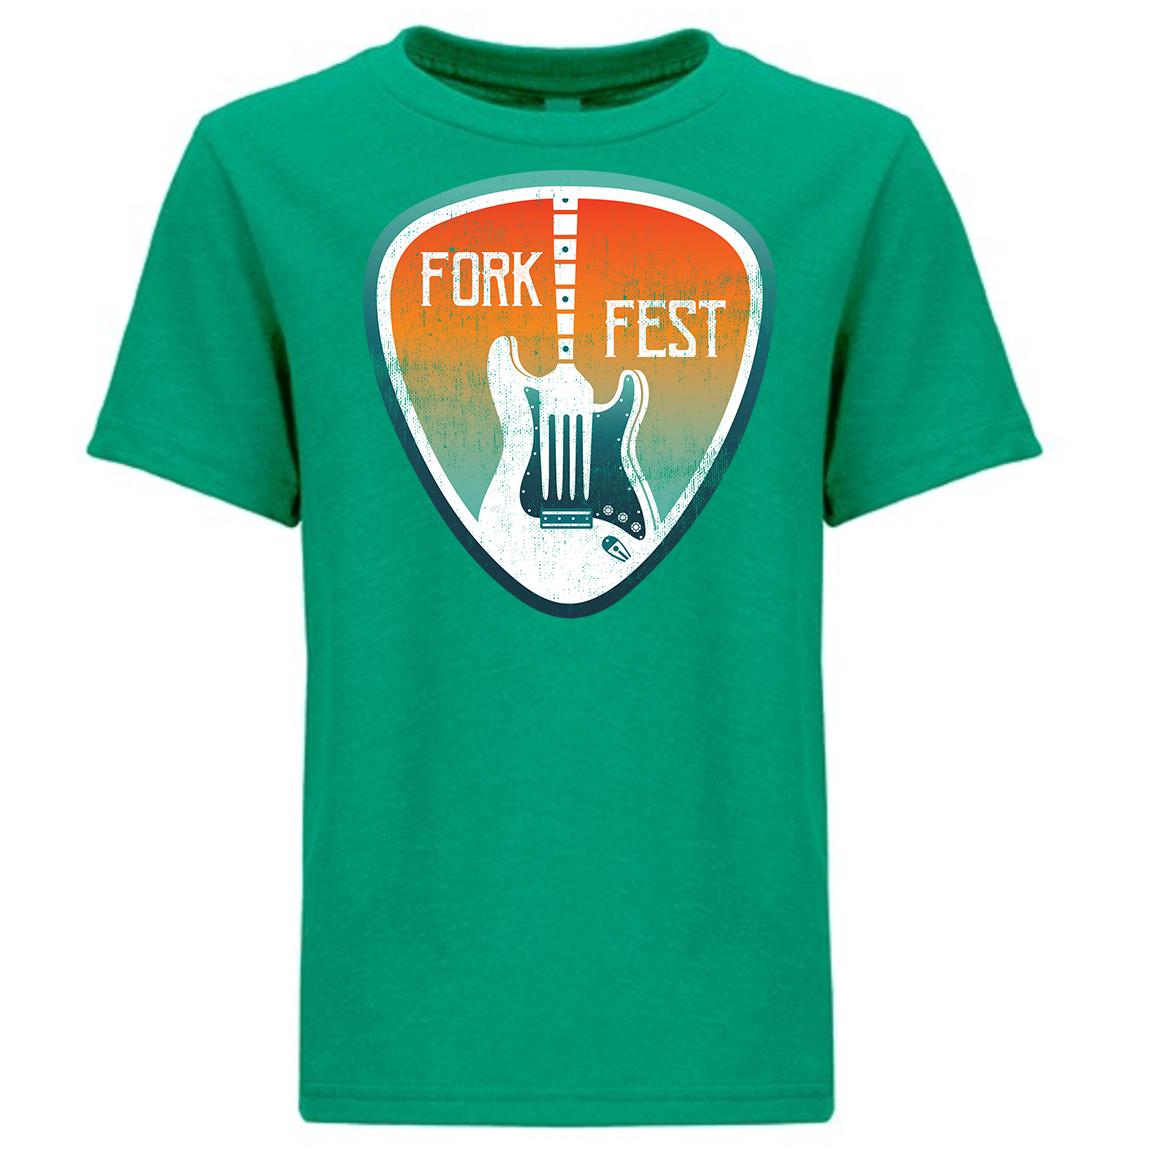 Green Youth Shirt.png